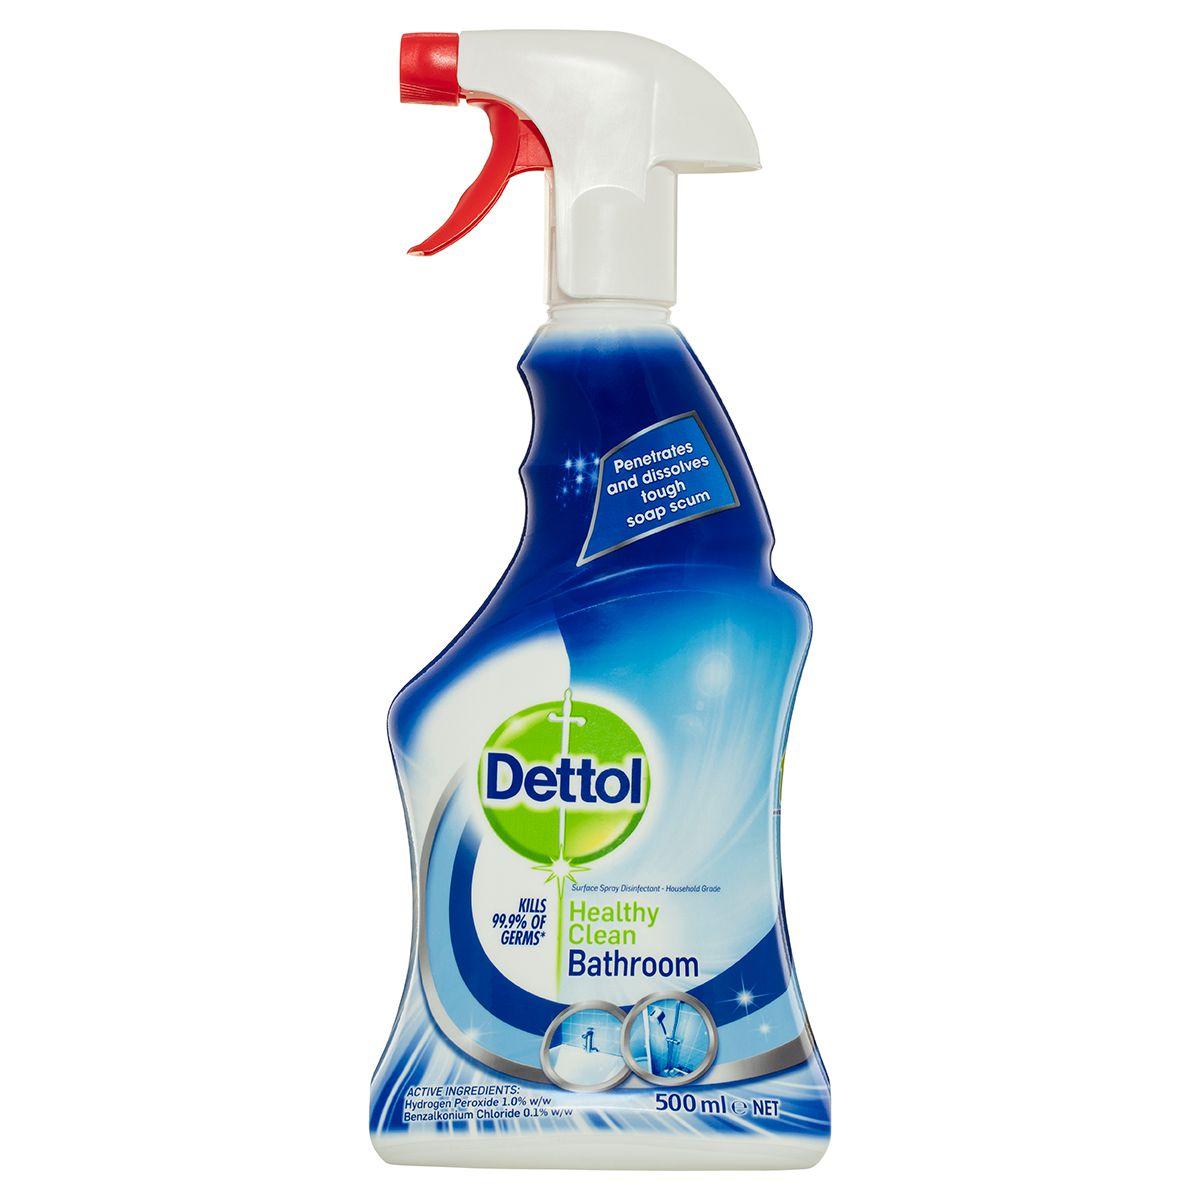 Dettol Healthy Clean Bathroom Spray 500mL